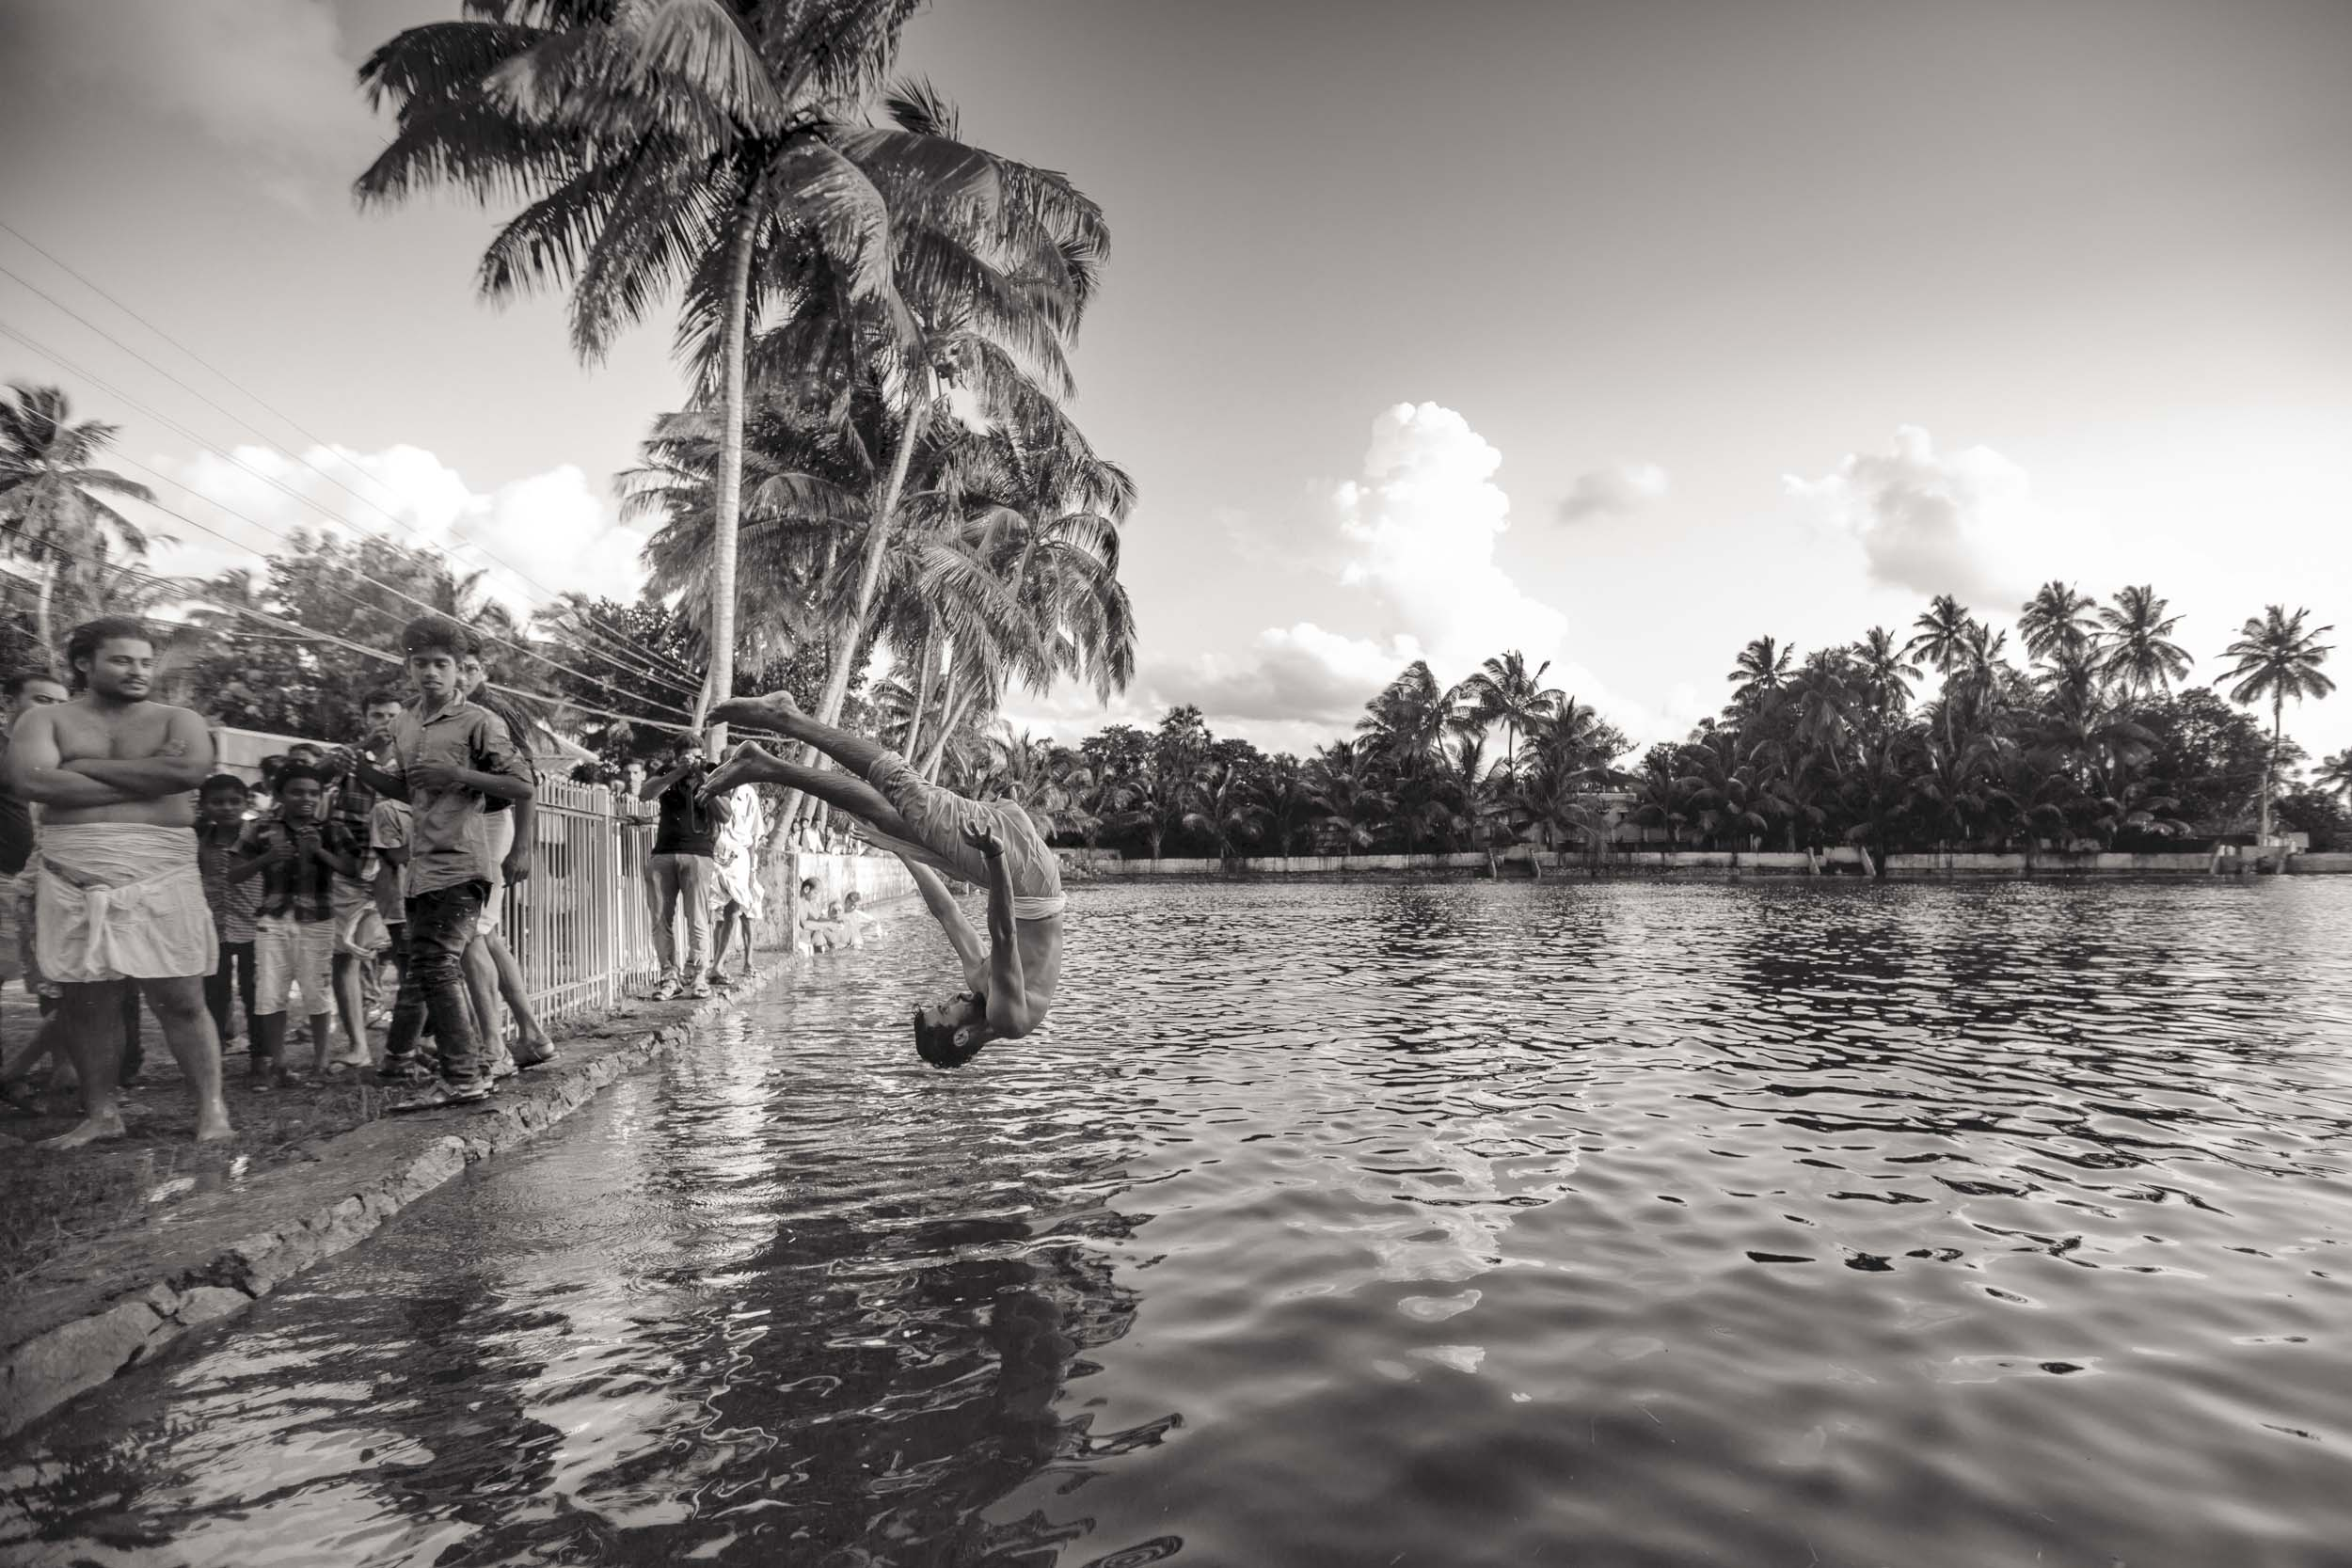 Sindhur_Photography_Travel_People_Kerala-53.JPG